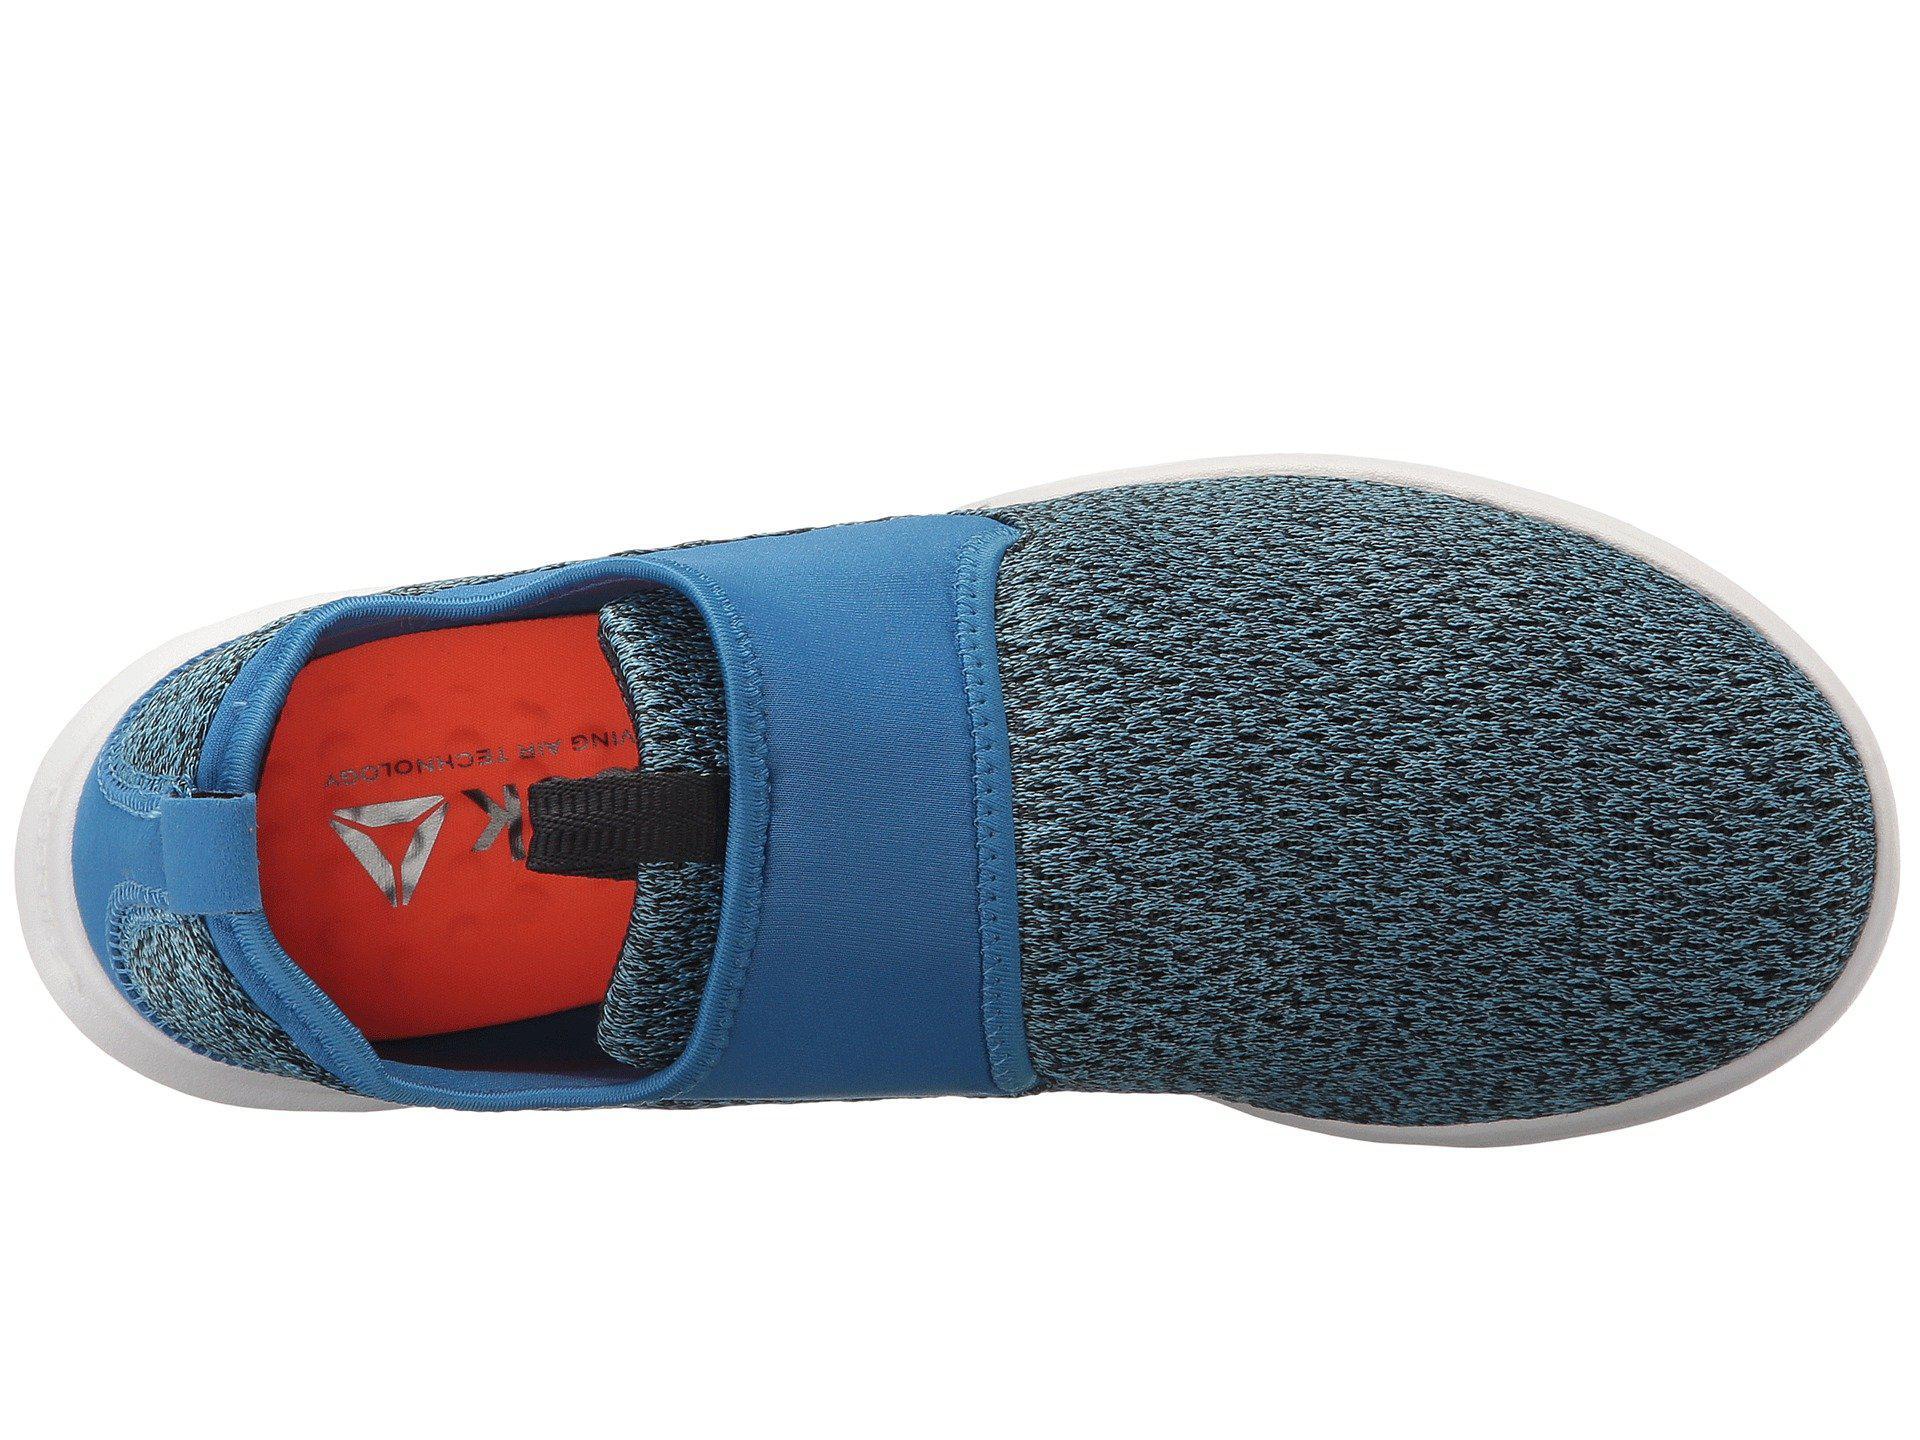 0e55c29015f Reebok - Blue Dmx Lite Slip Walking Shoe - Lyst. View fullscreen